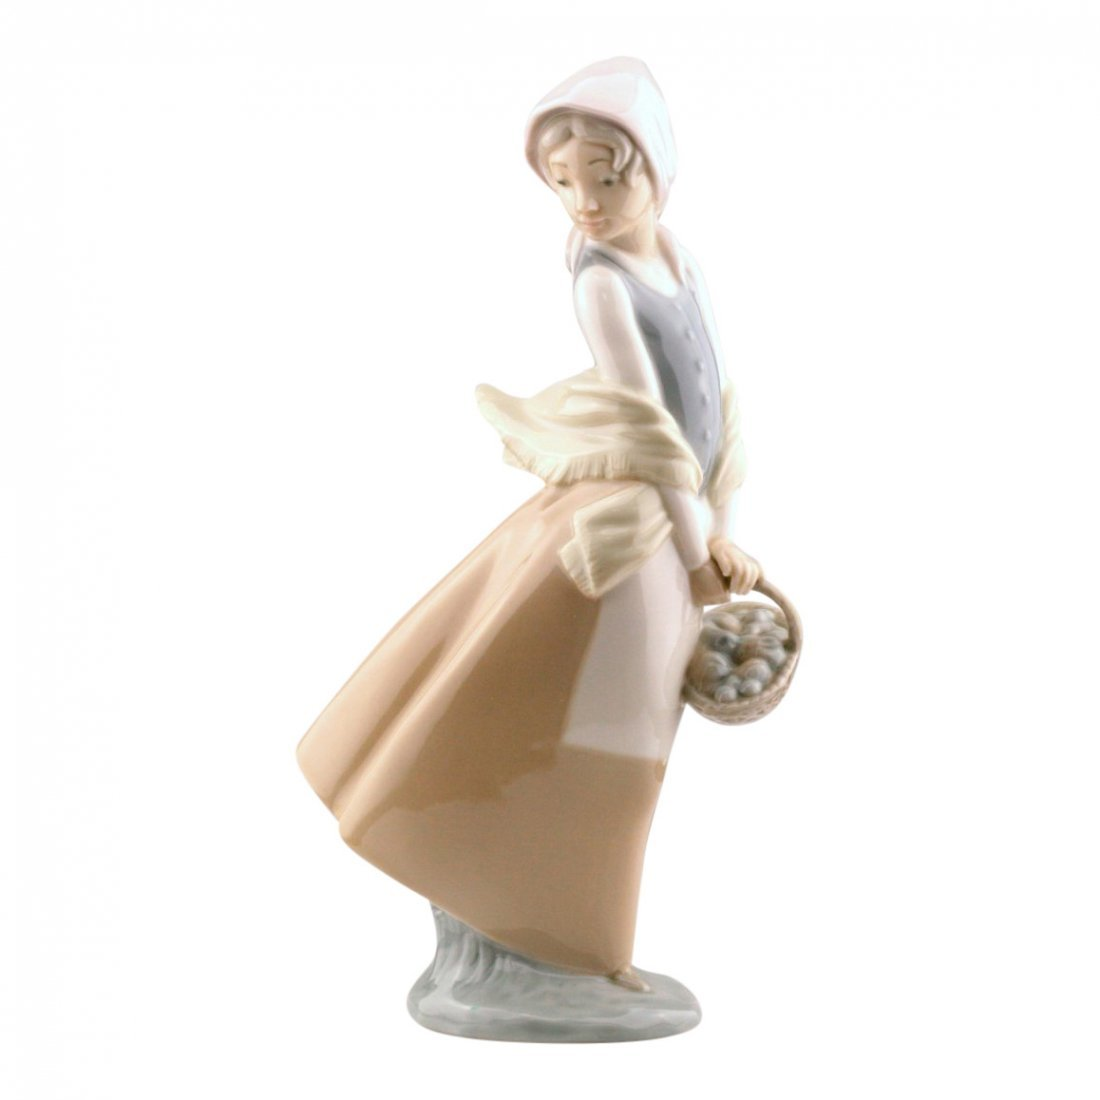 Lladro Nao Woman With Basket Figurine